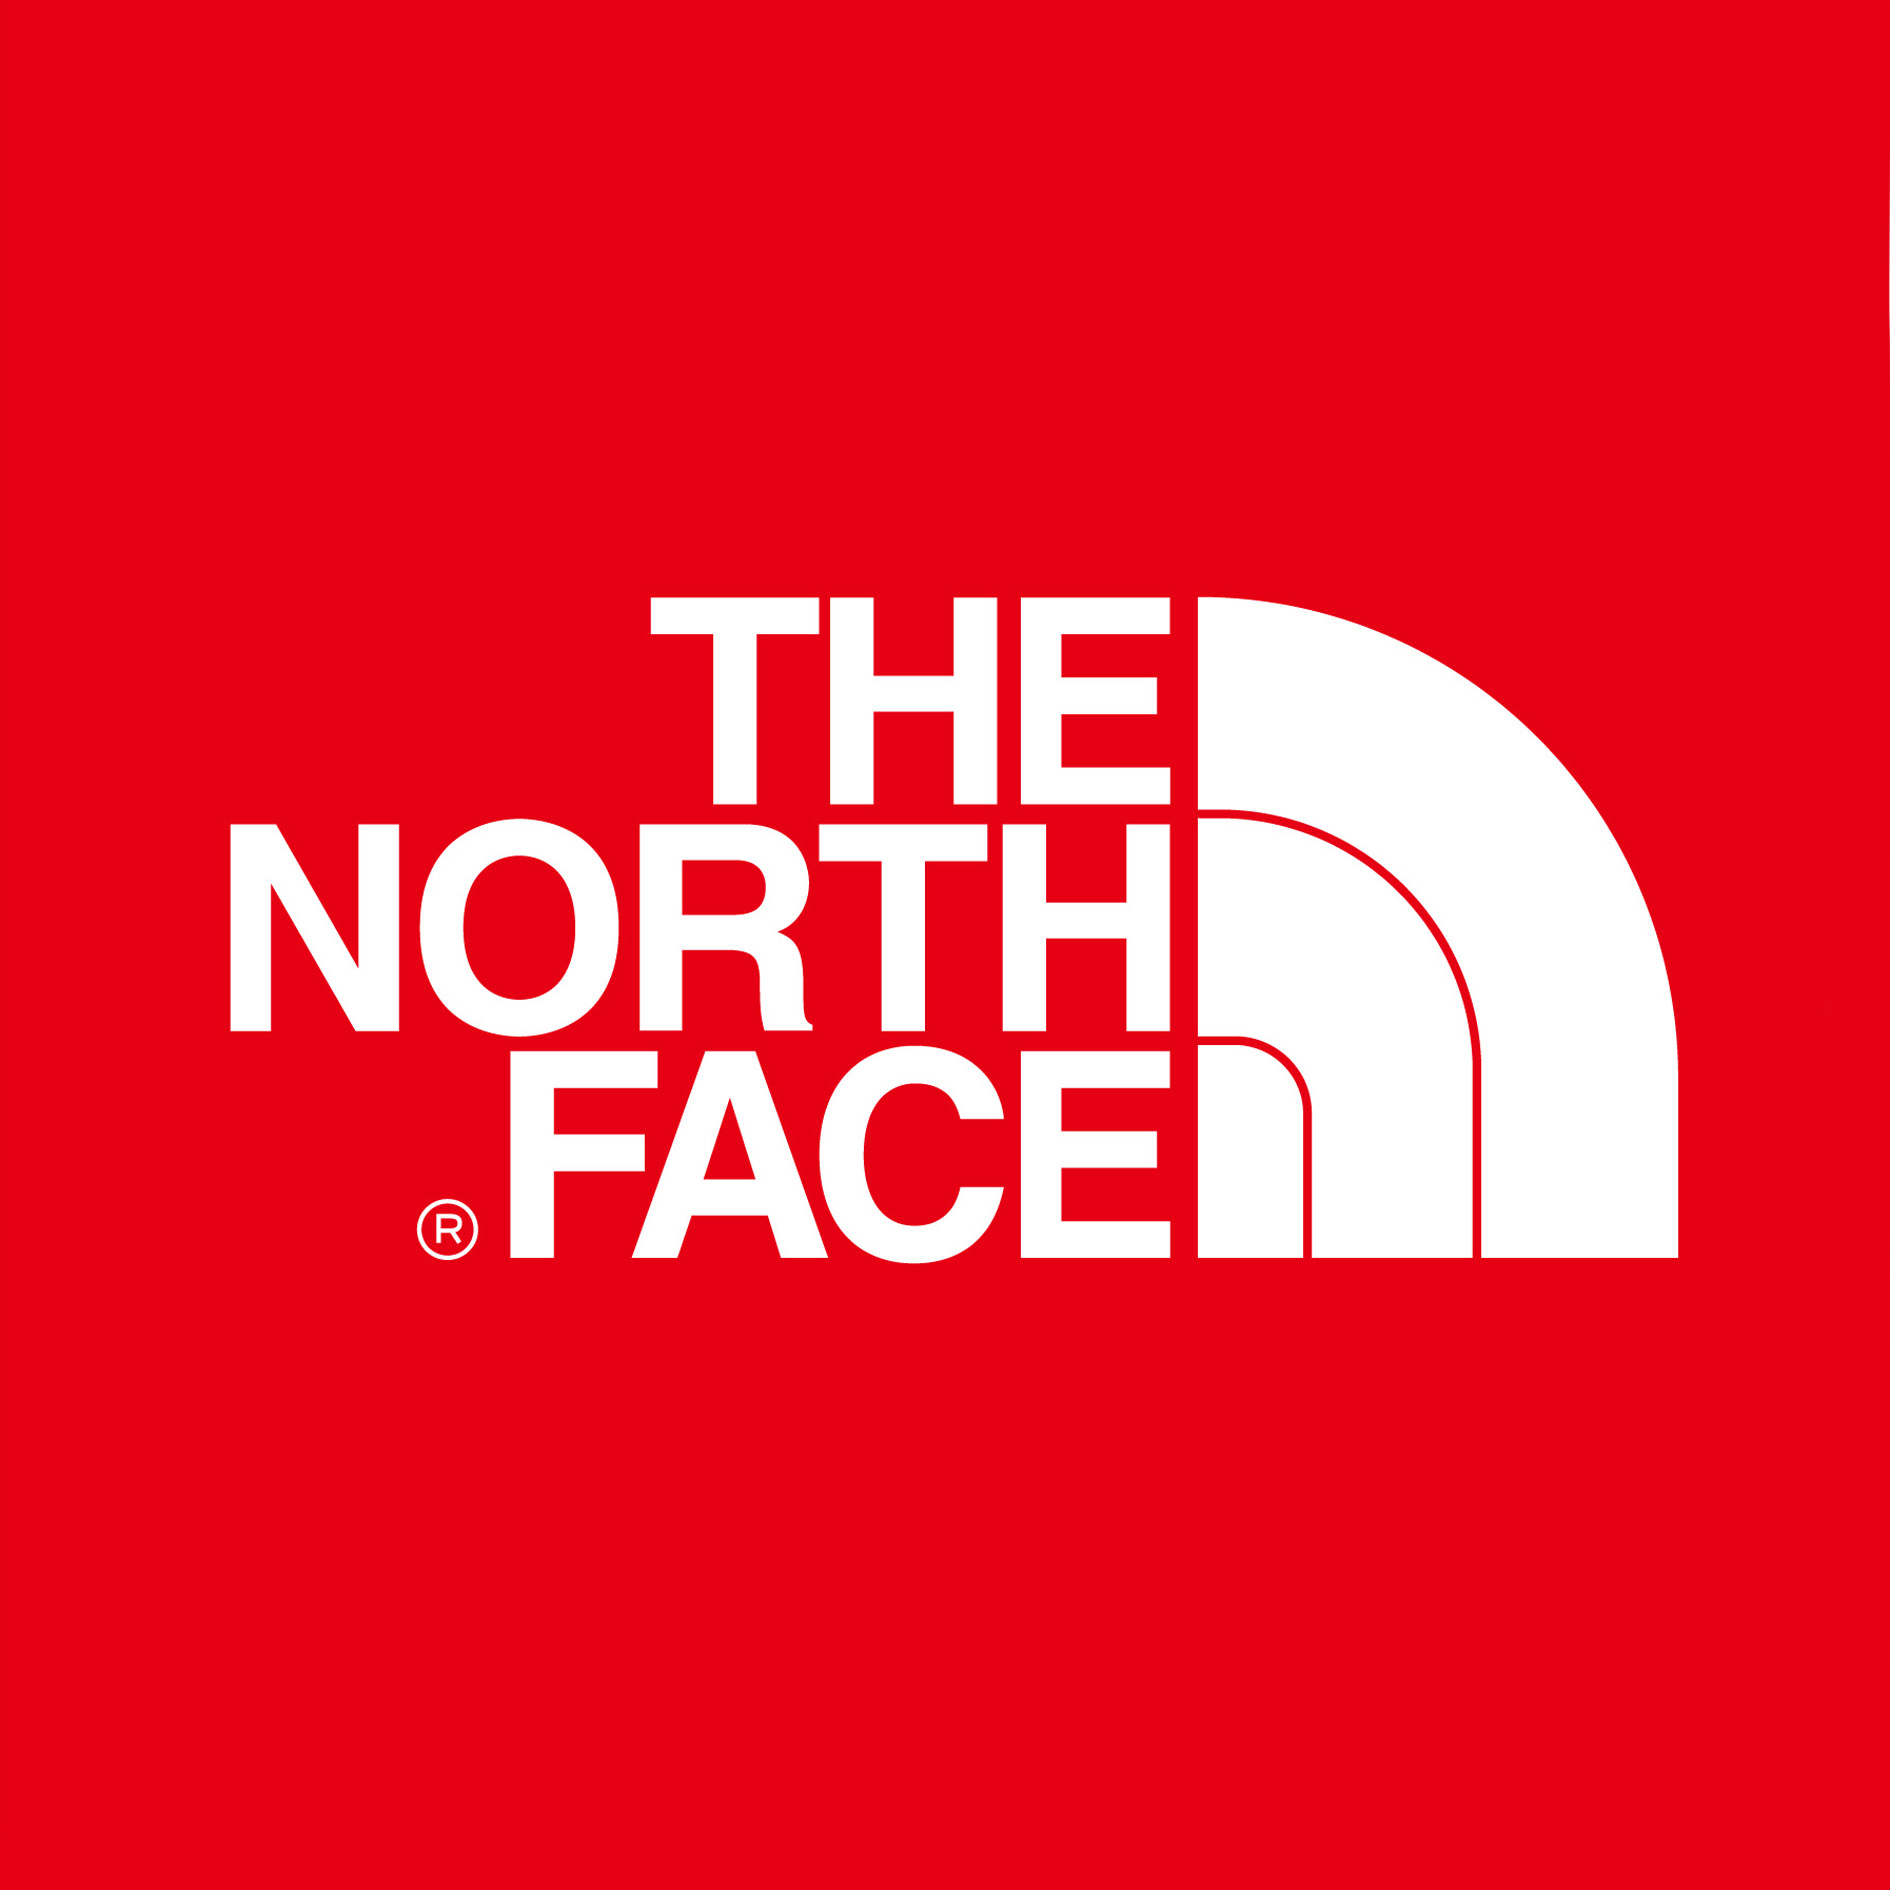 the-northface-logo.jpg